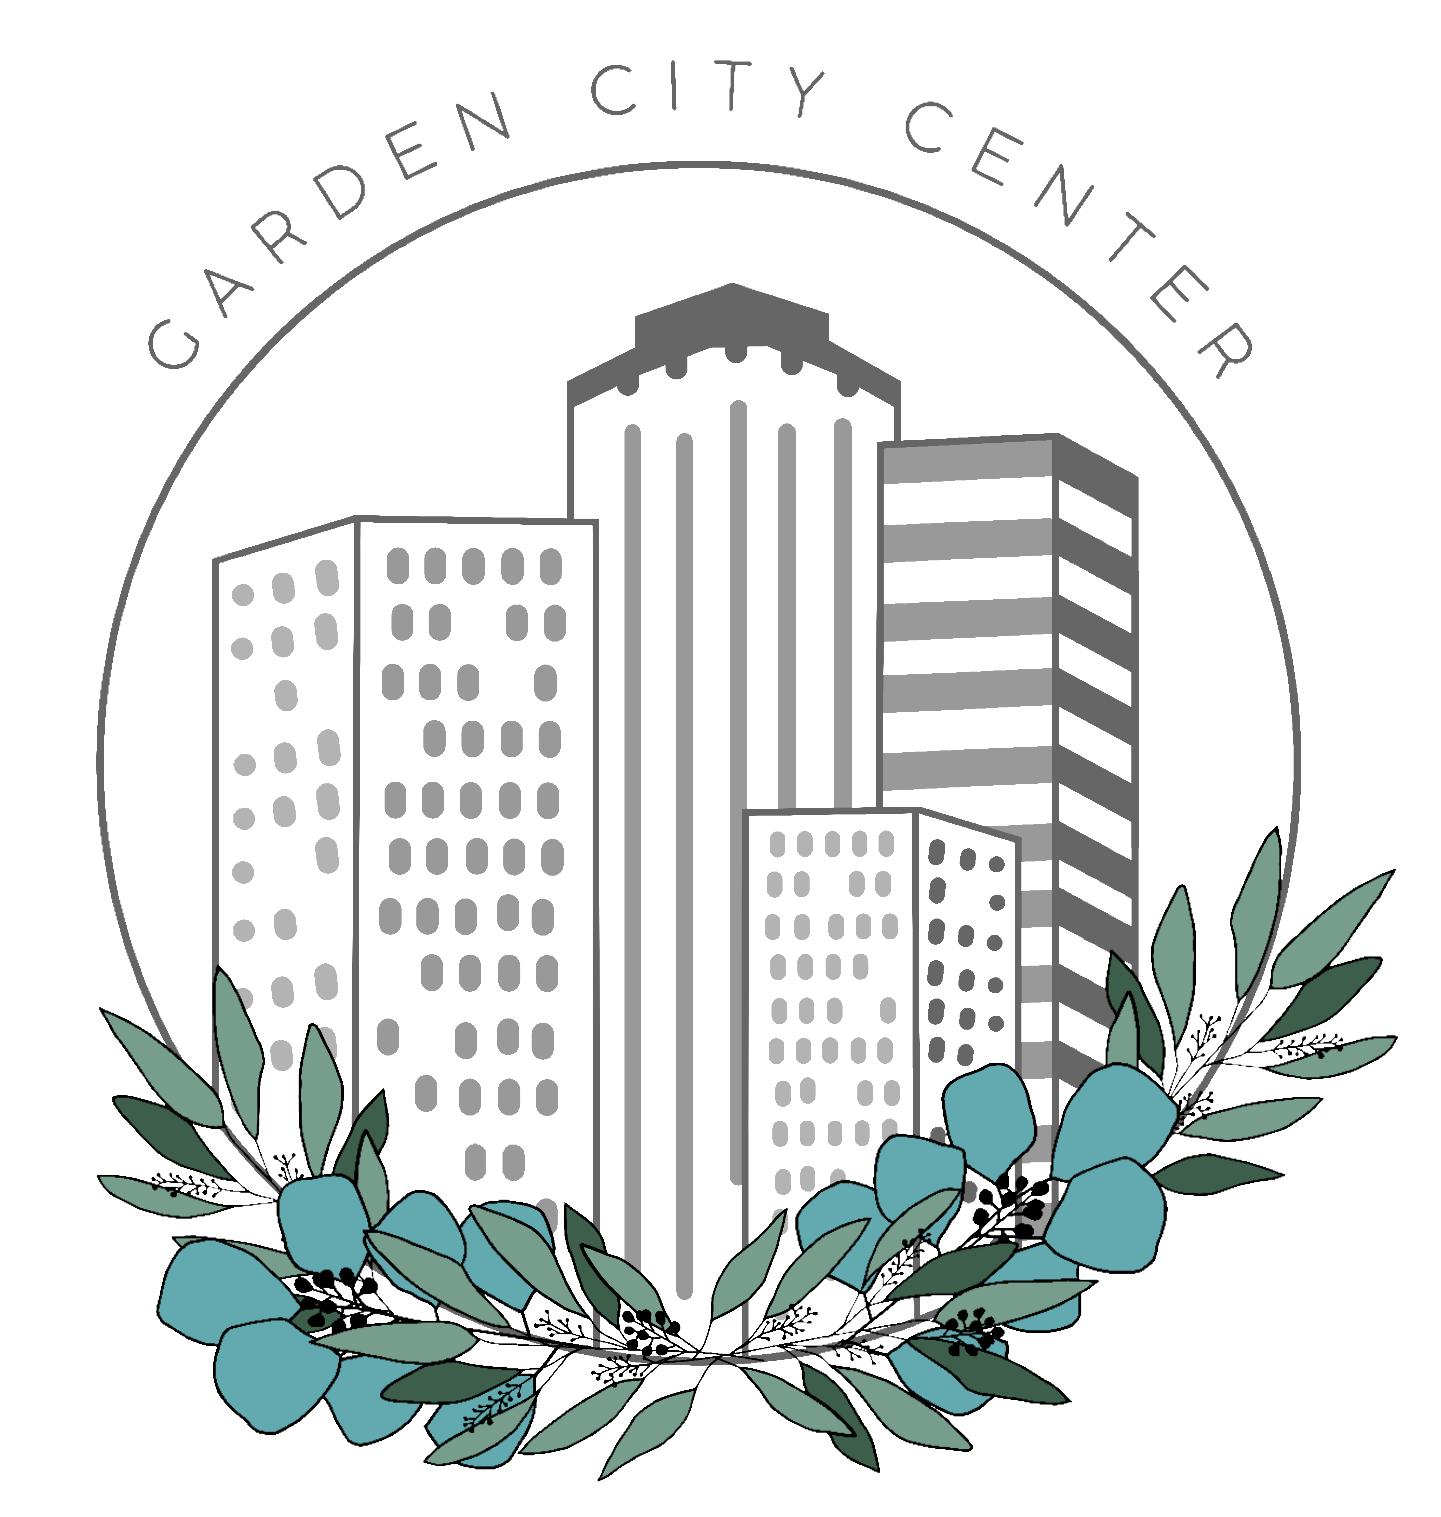 Garden City Center About